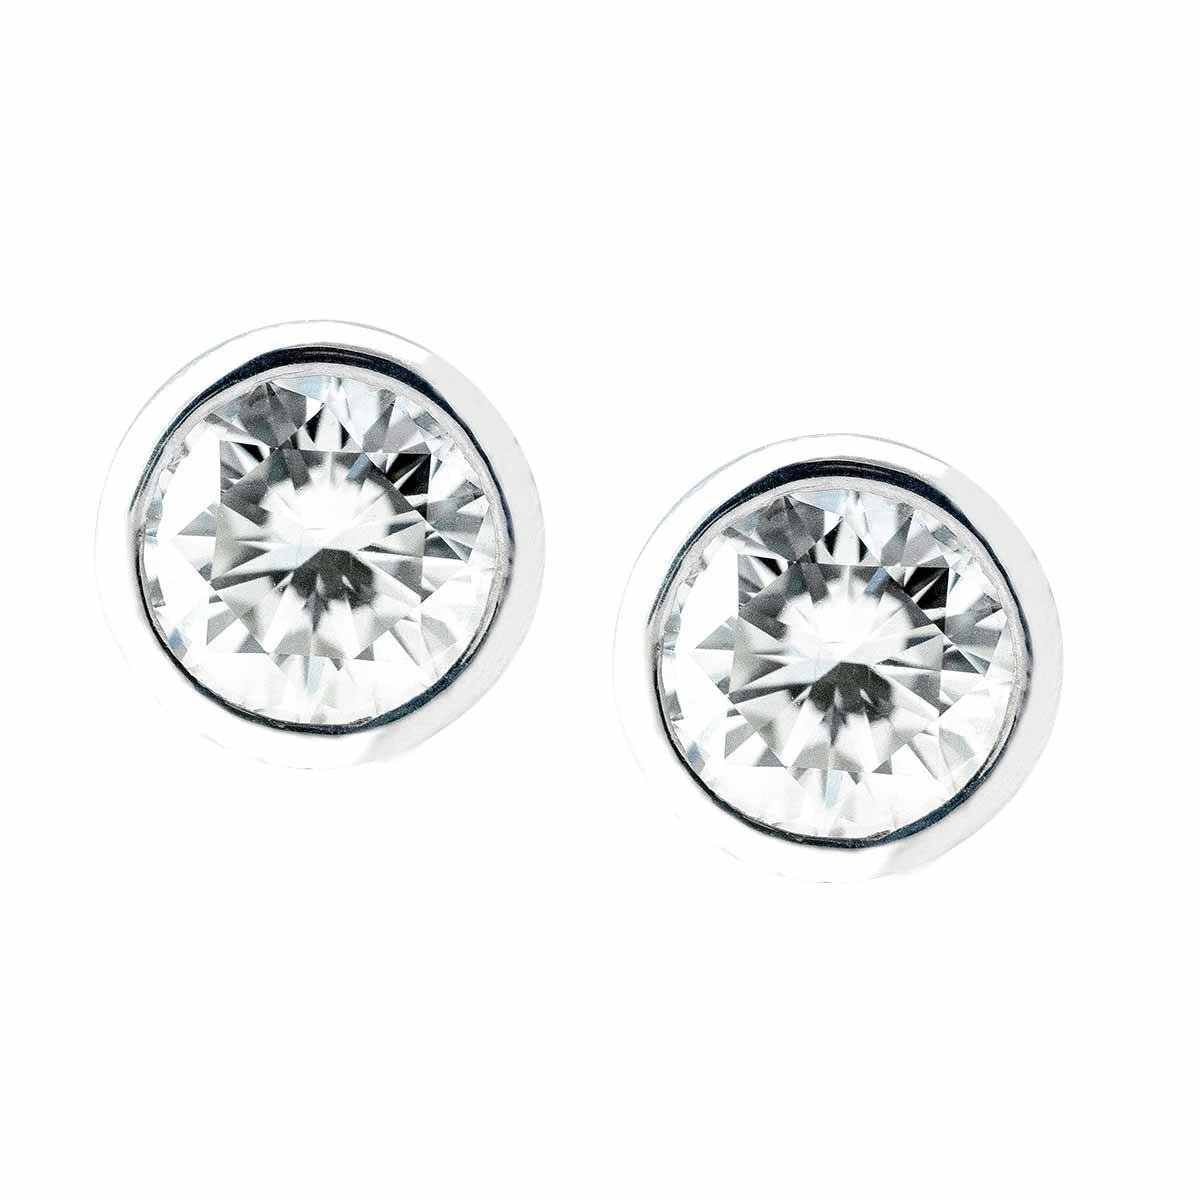 New 1.18 CTW Diamond Stud Earrings